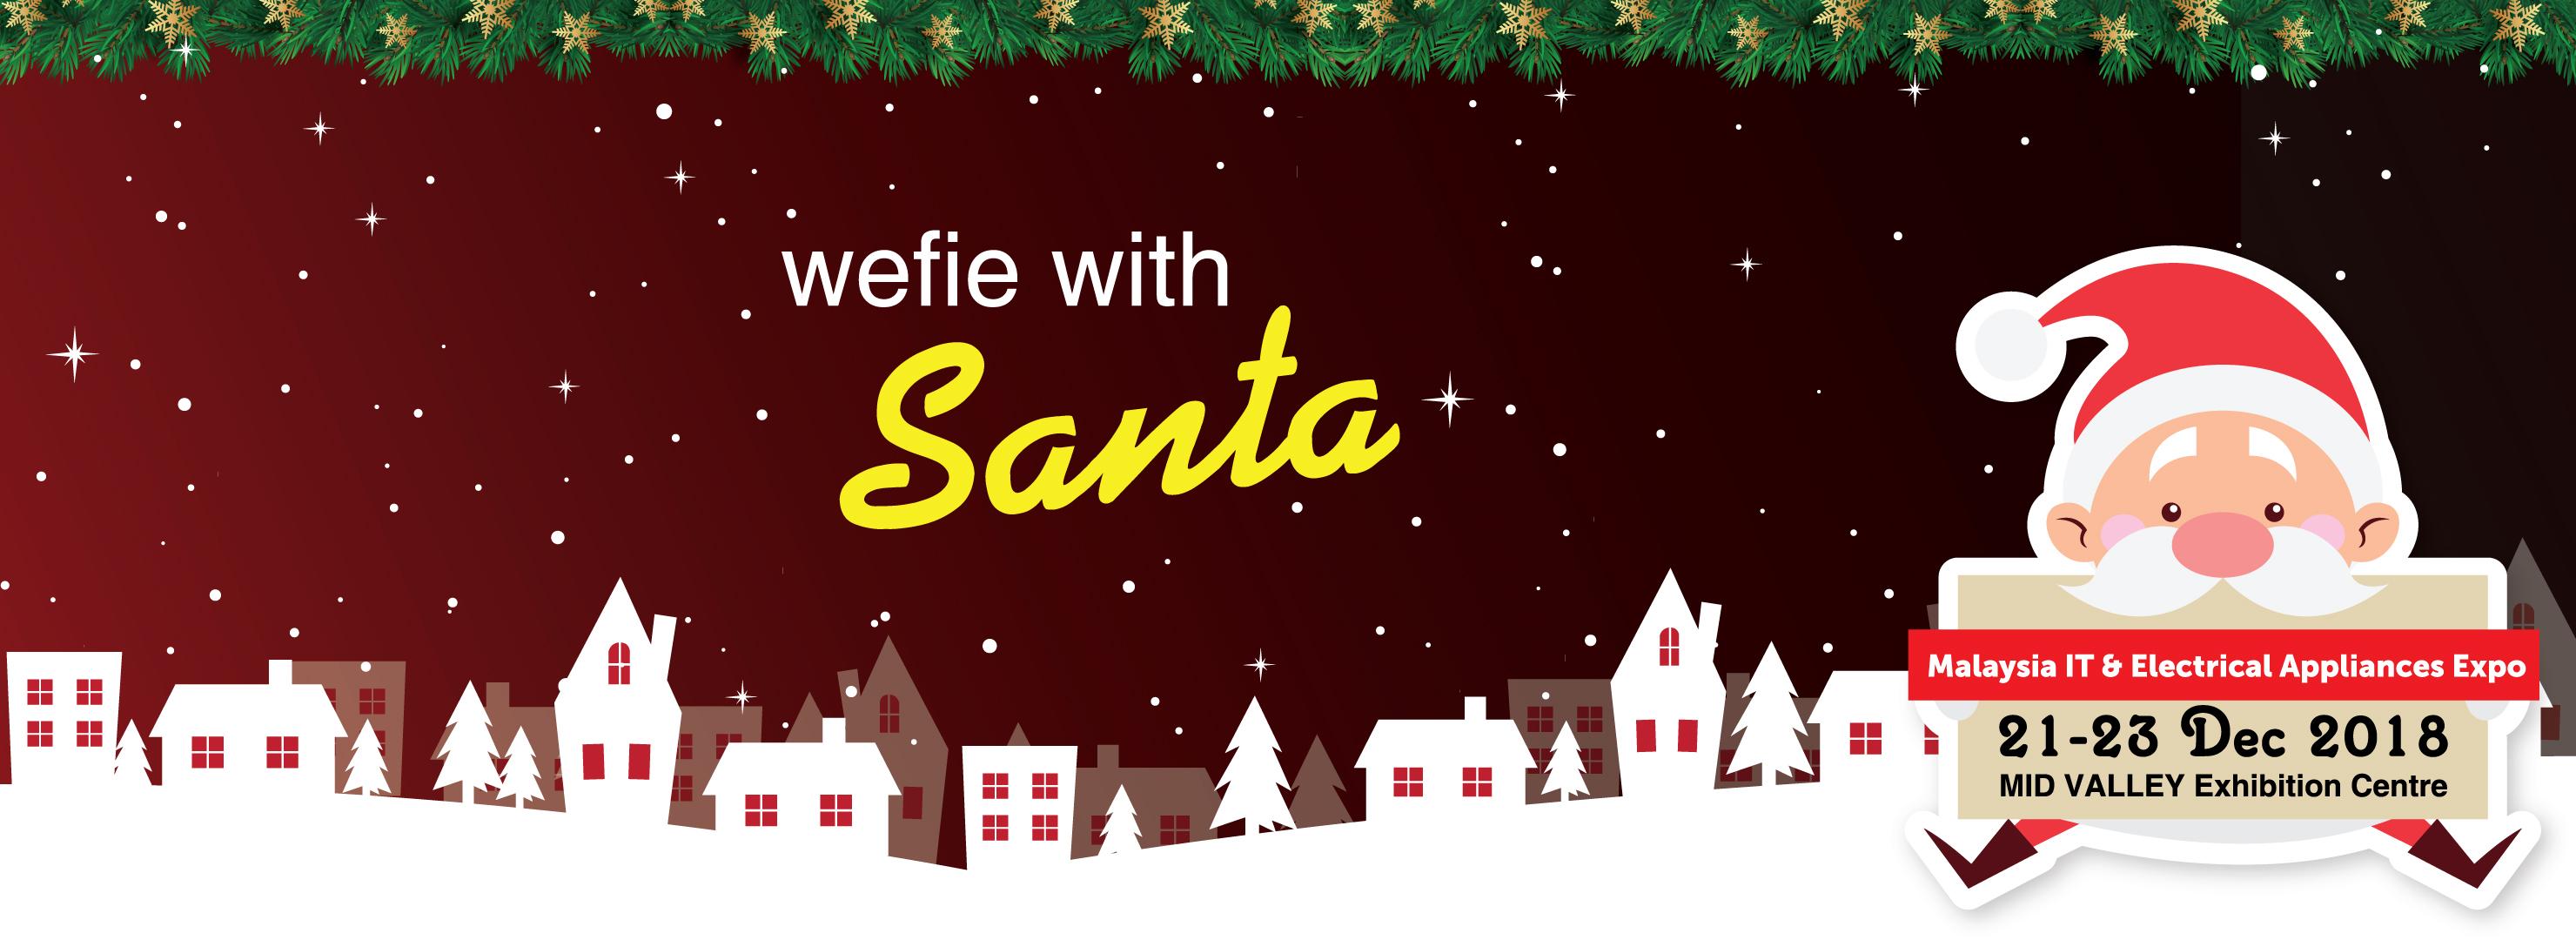 MITE-Online-Advs-740-X-270-Santa